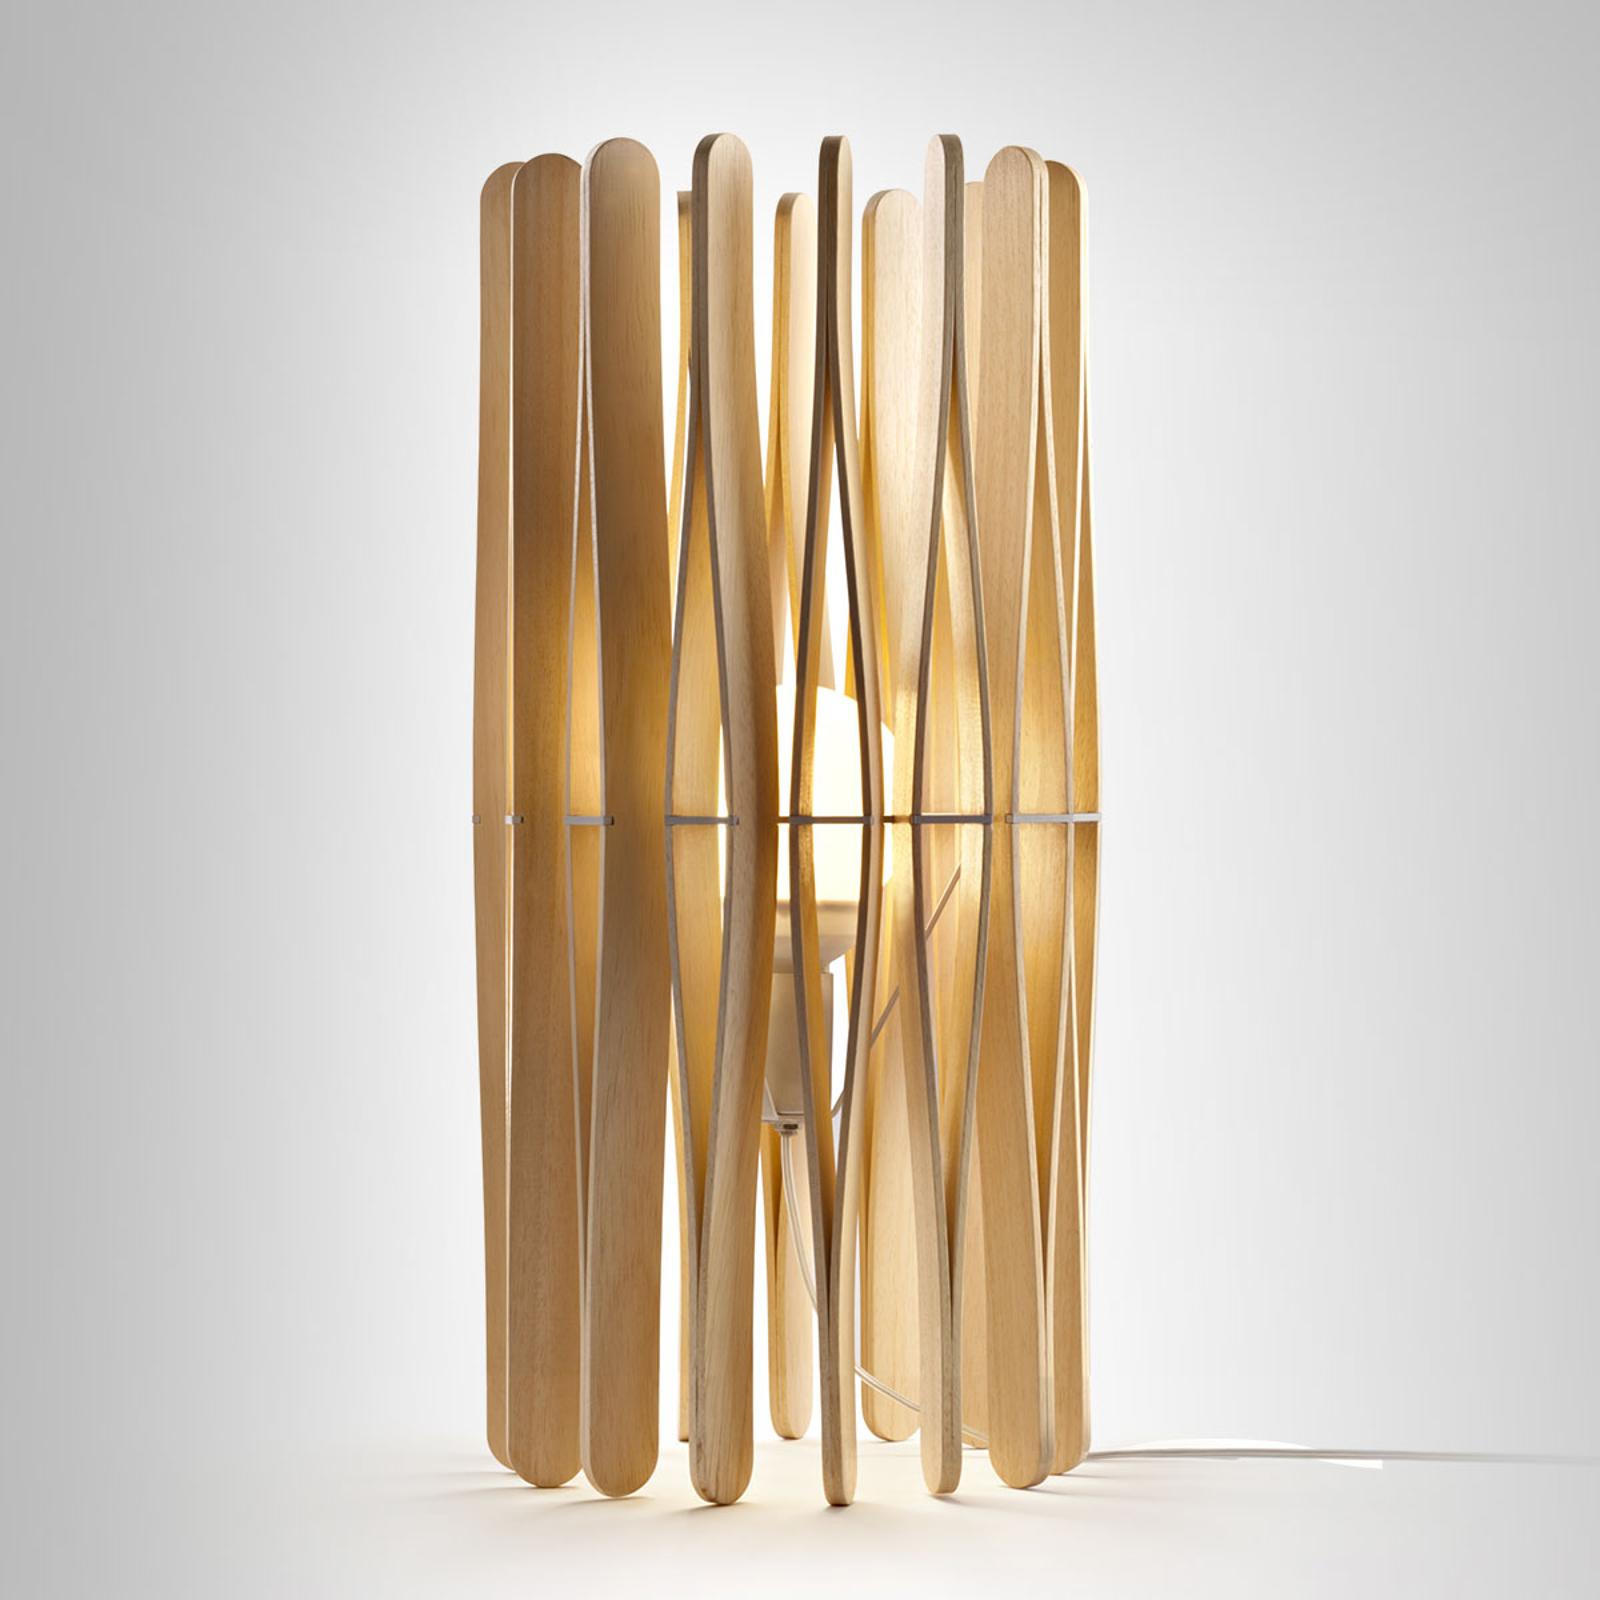 Fabbian Stick bordslampa i trä, cylindrisk